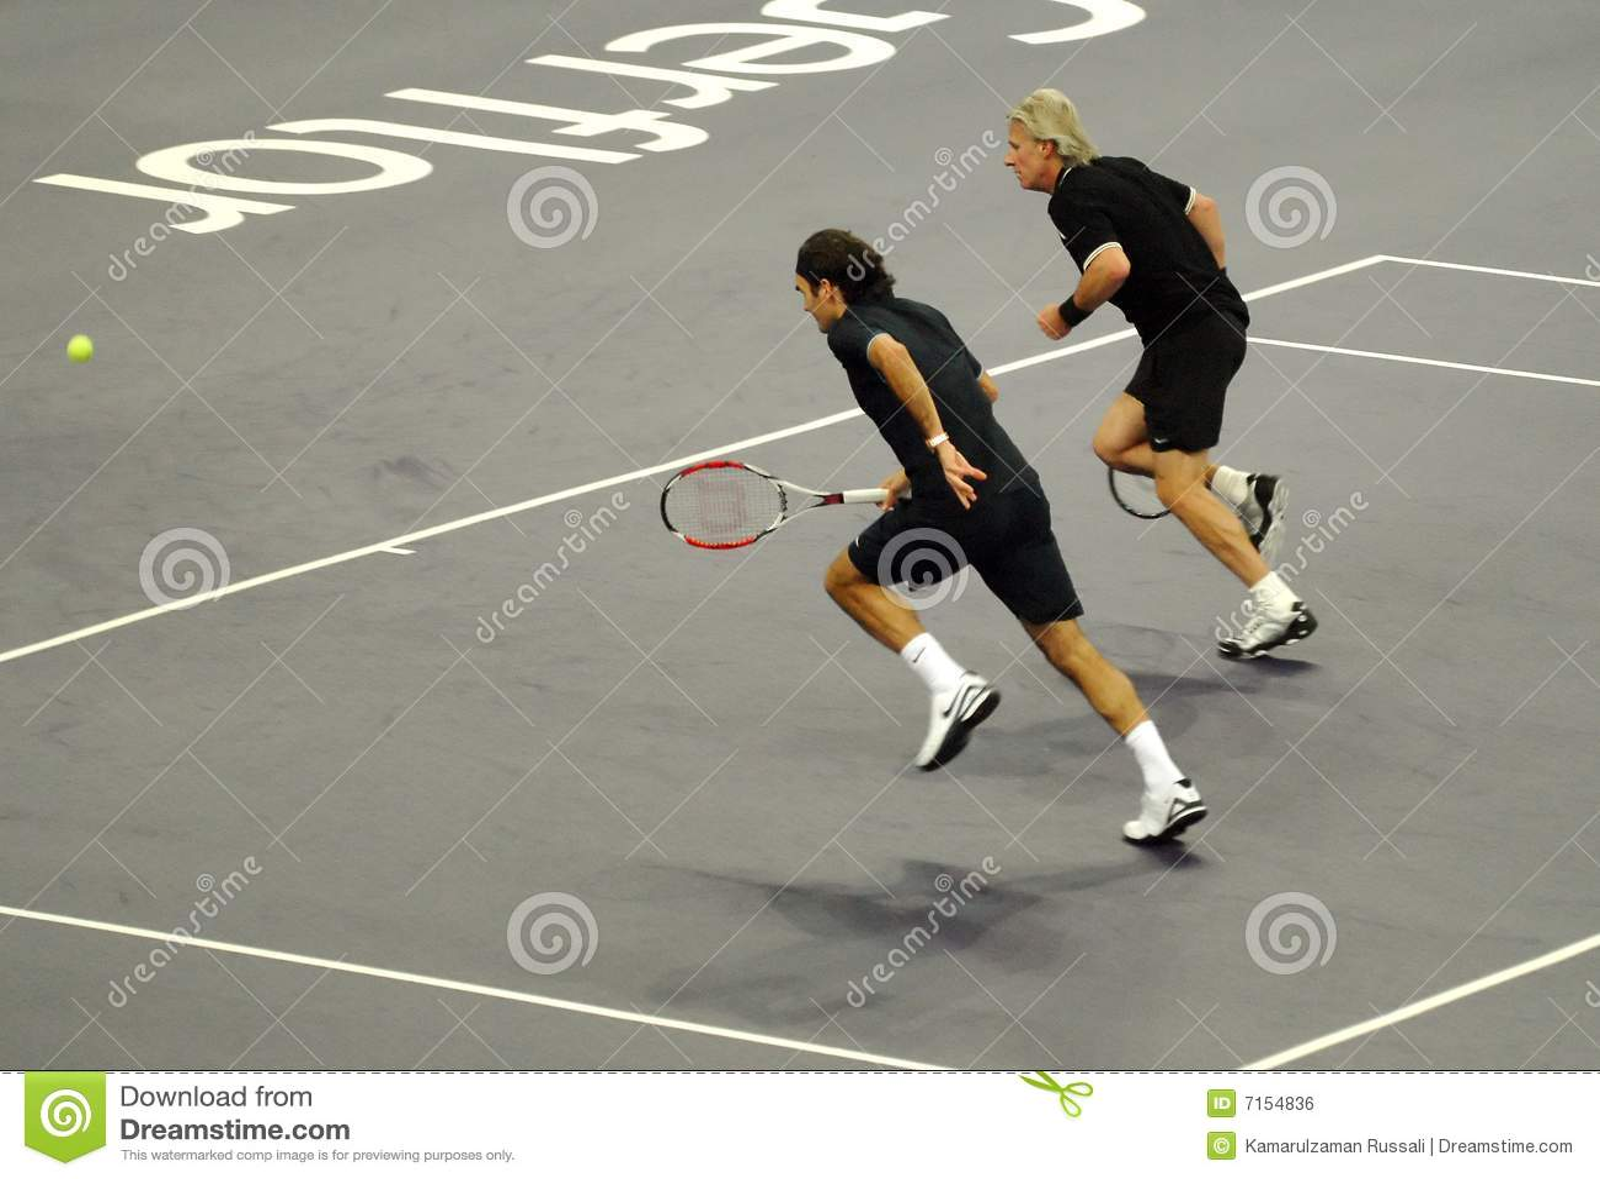 Roger Federer et Bjorn Borg dans les actions